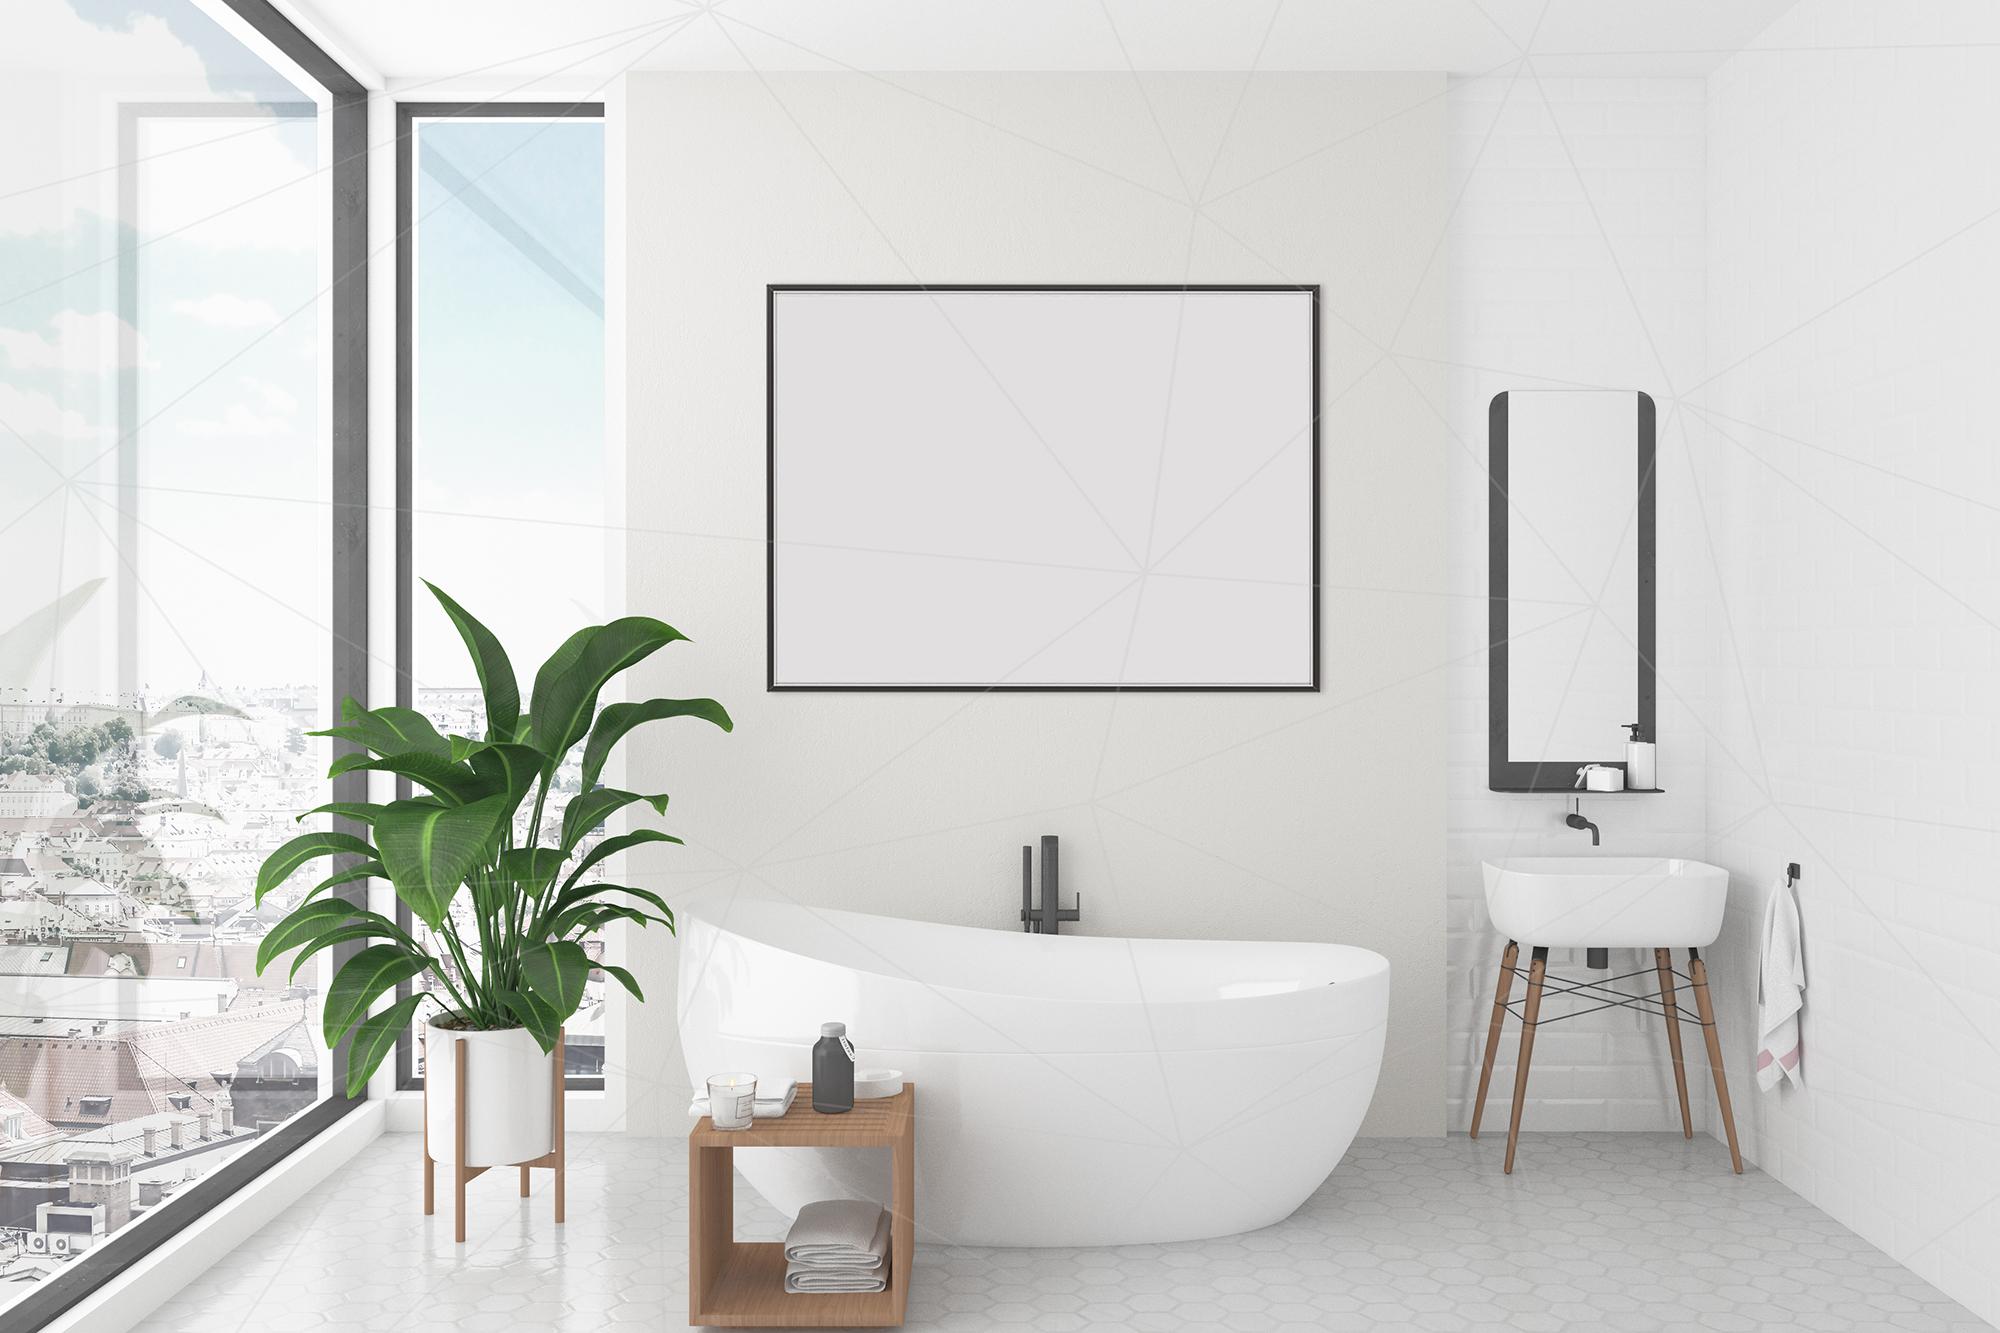 Interior Mockup Bundle Bathroom Background